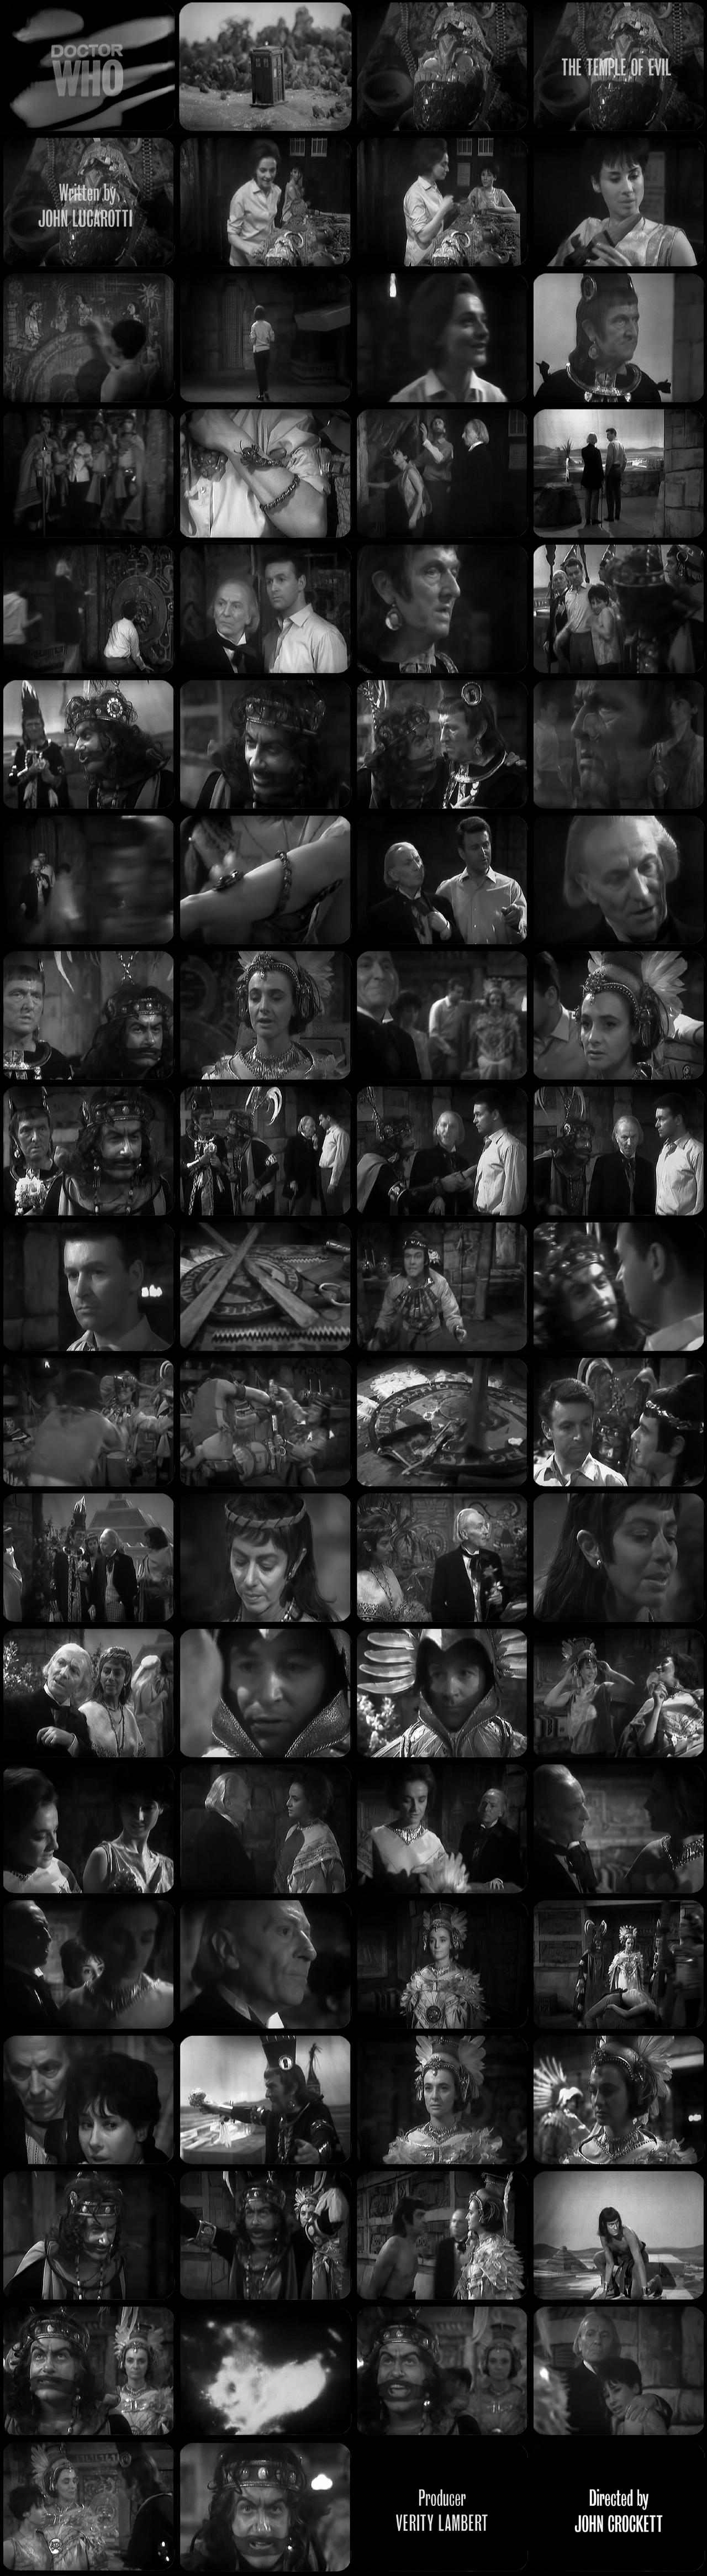 The Aztecs Episode 1 Tele-Snaps